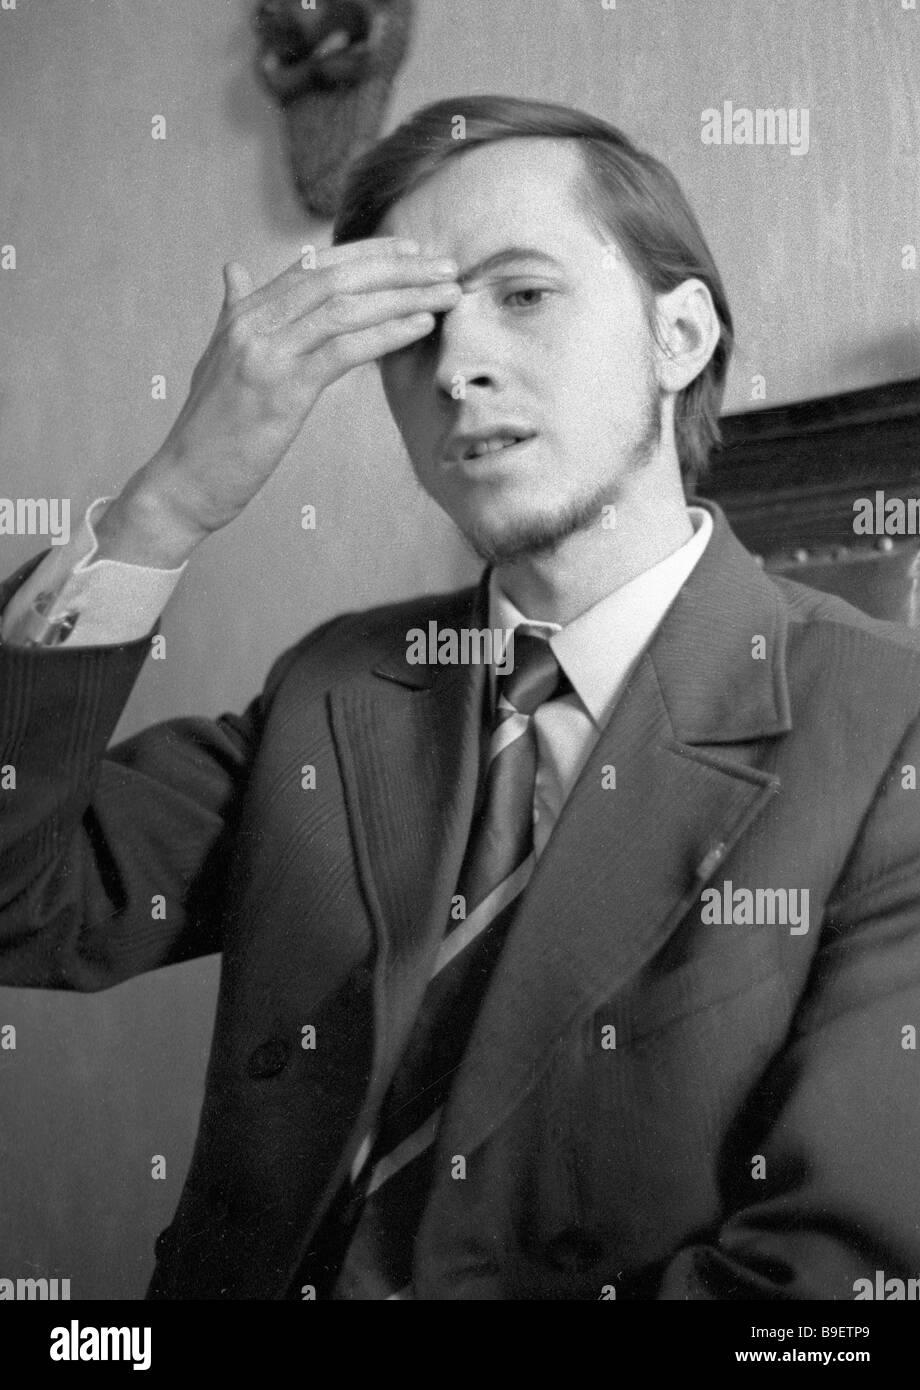 Director and actor Nikolai Burlyaev